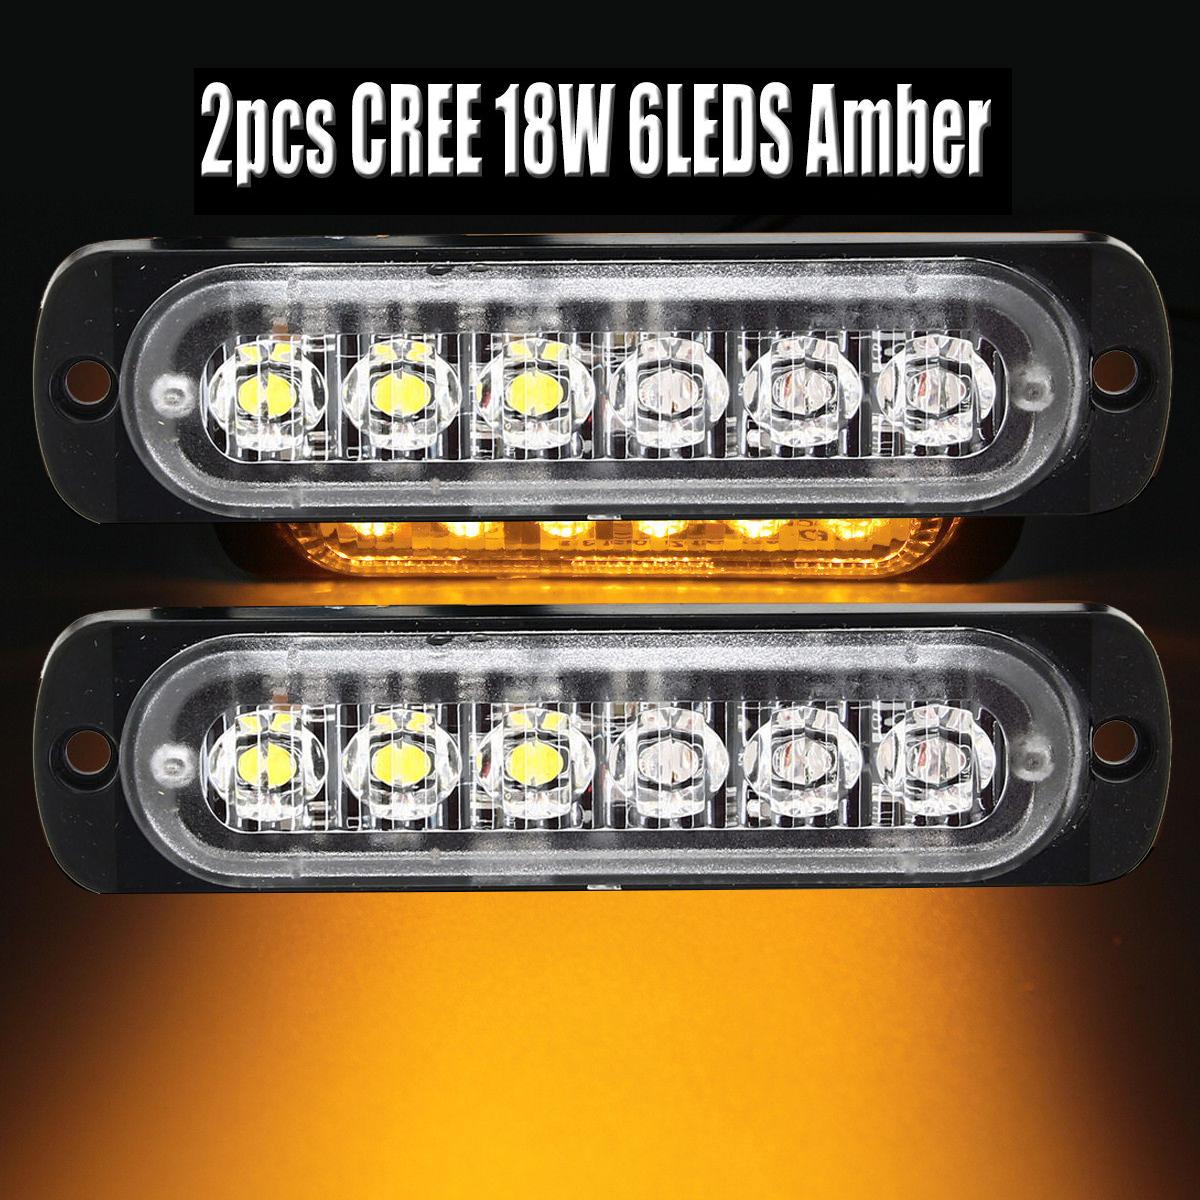 Details about 2pcs 6 LED Car Truck Amber Flash Light Bar Warning Emergency Strobe Lamp 12/24V